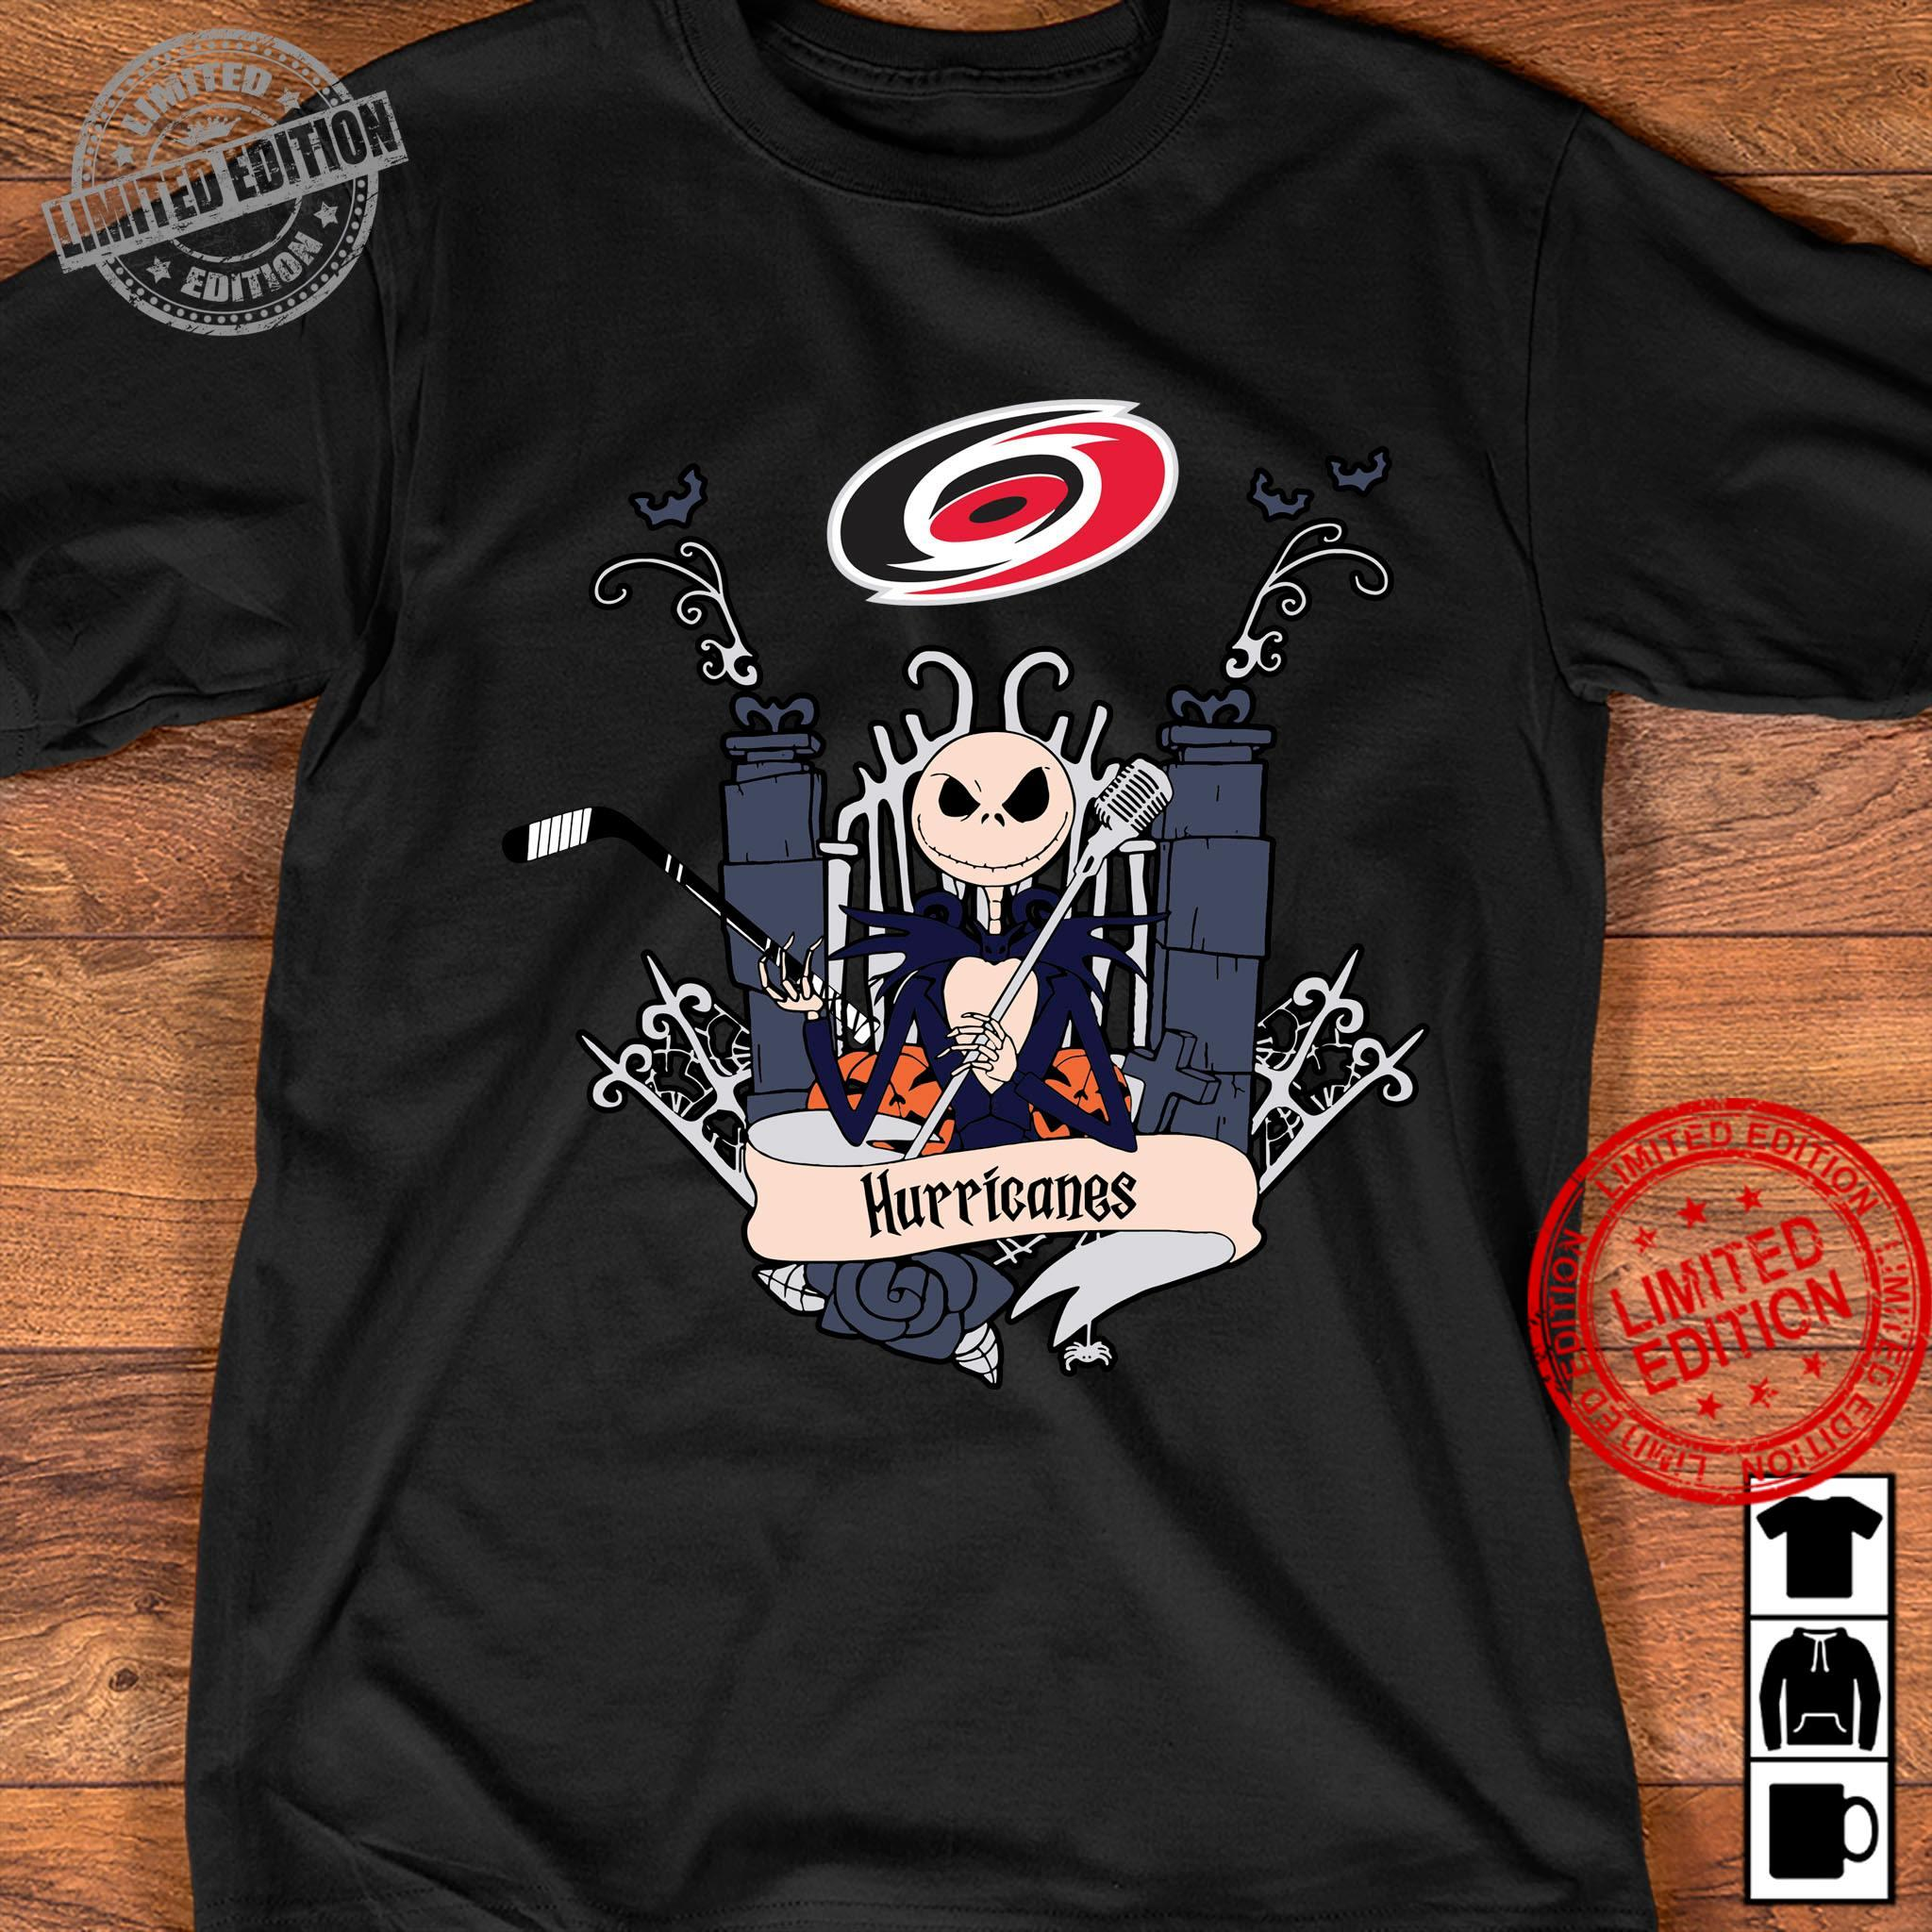 Jack Skellington Hurricanes Shirt